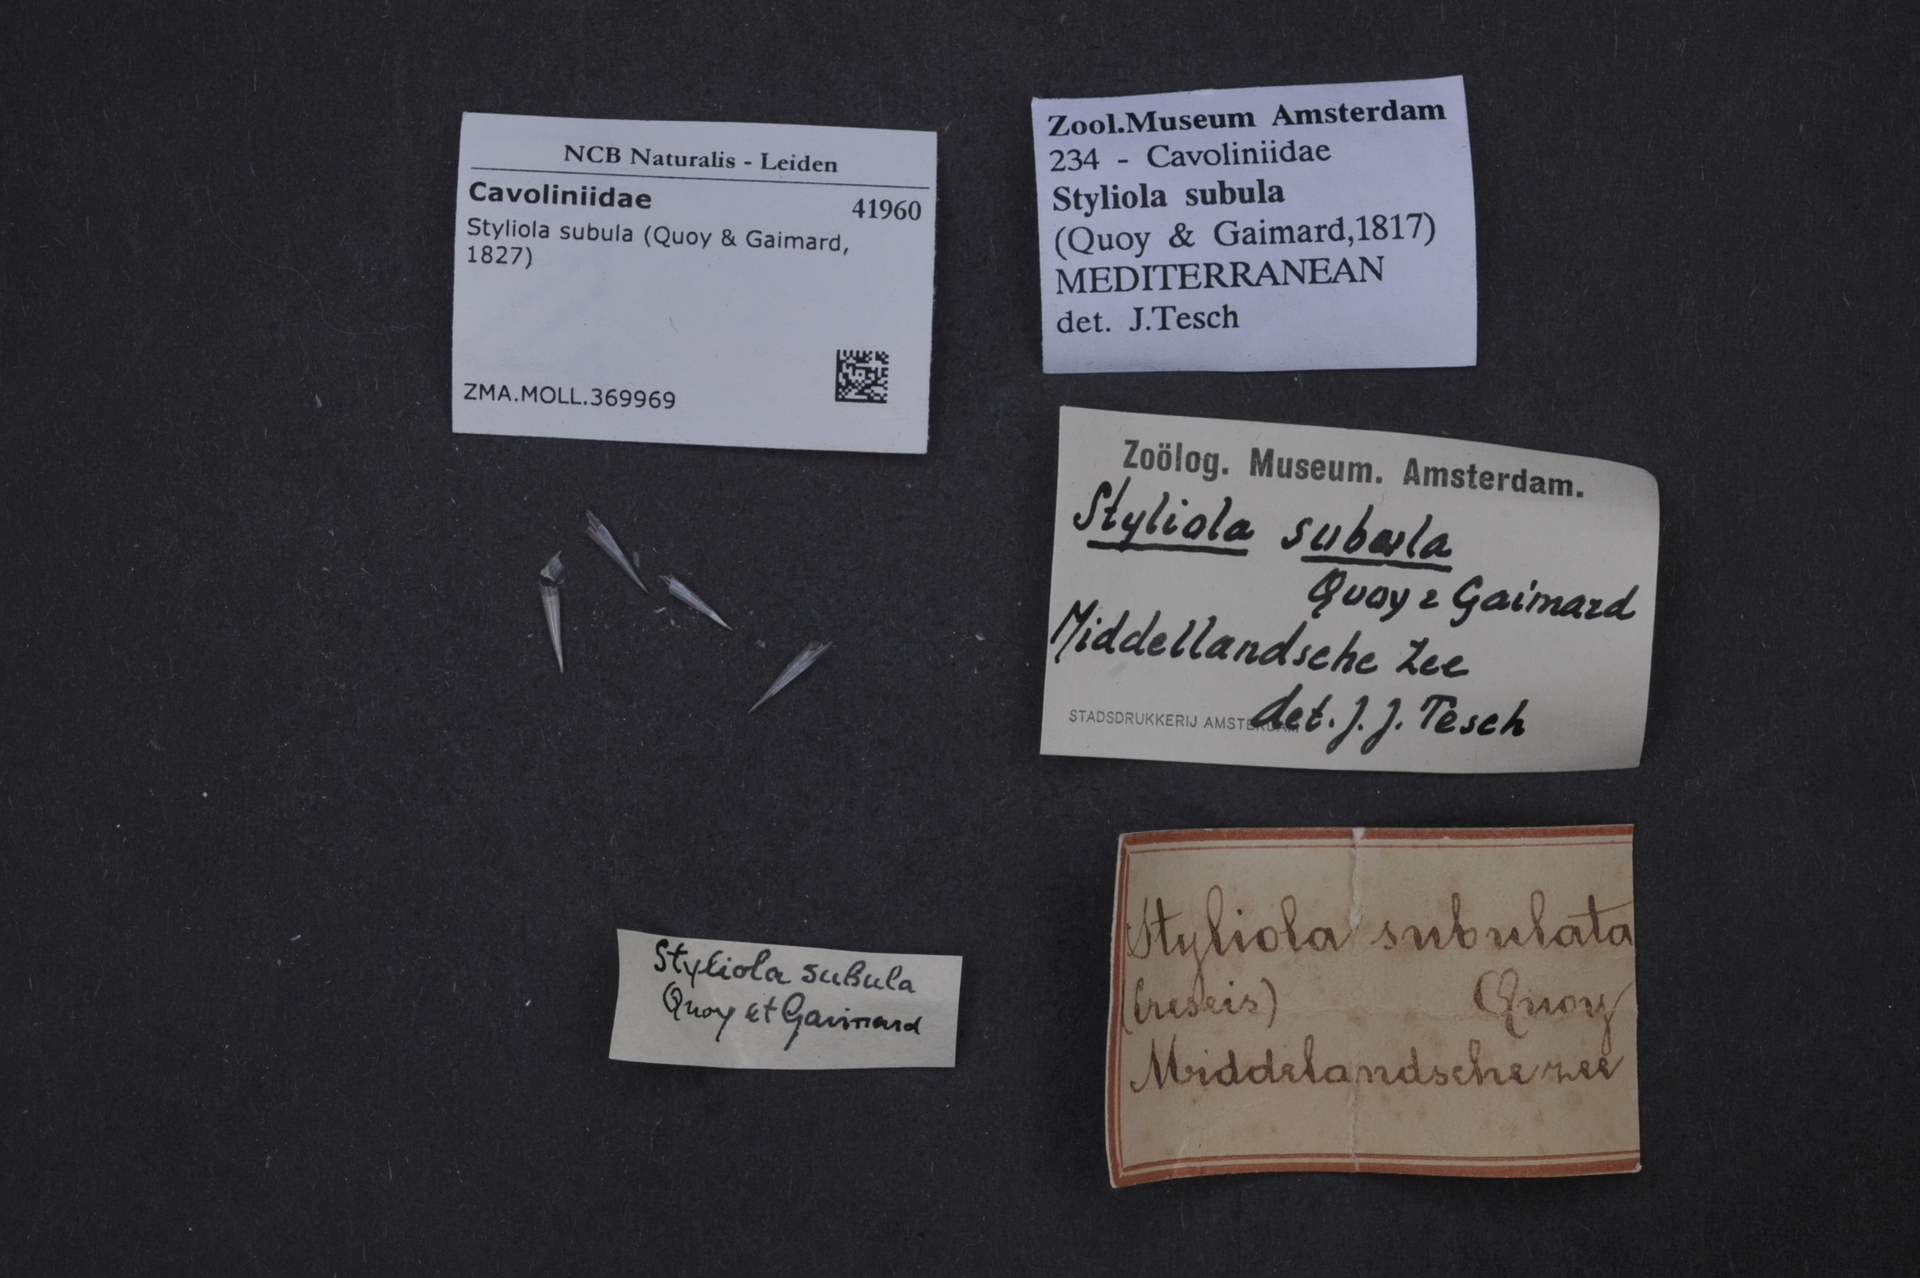 ZMA.MOLL.369969 | Styliola subula (Quoy & Gaimard, 1827)